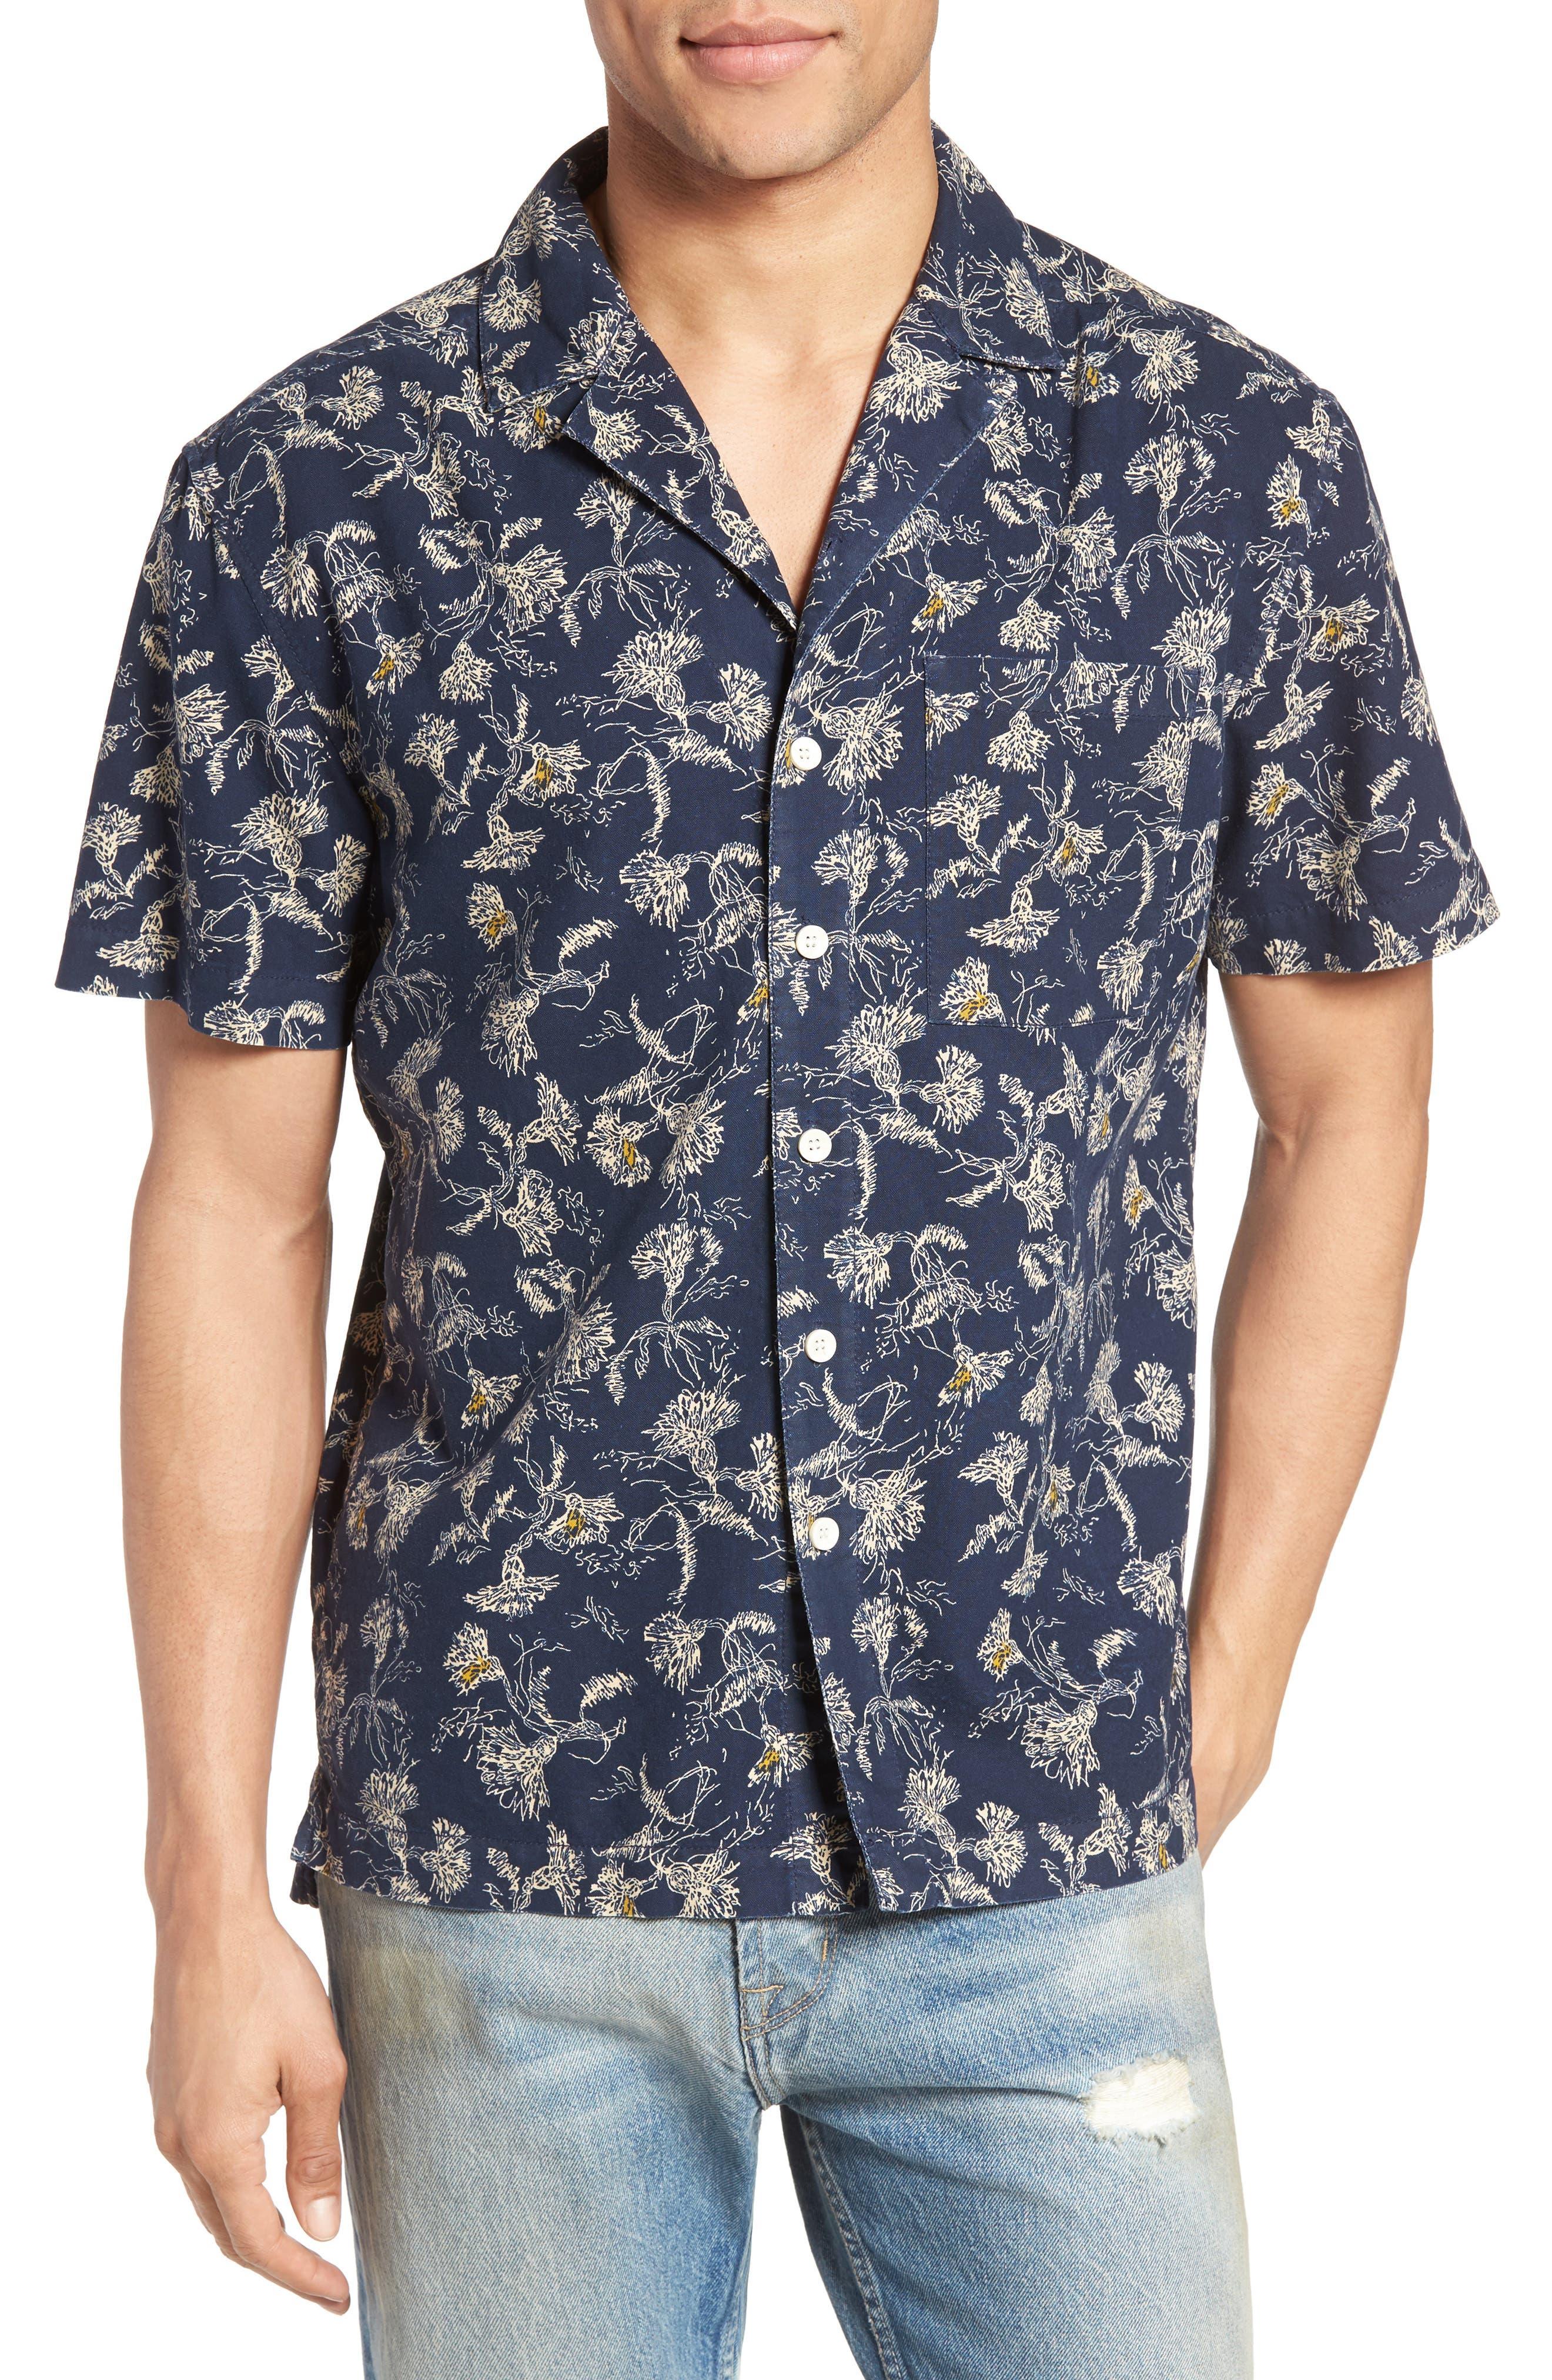 CURRENT/ELLIOTT Dandelion Print Cotton Cabana Shirt